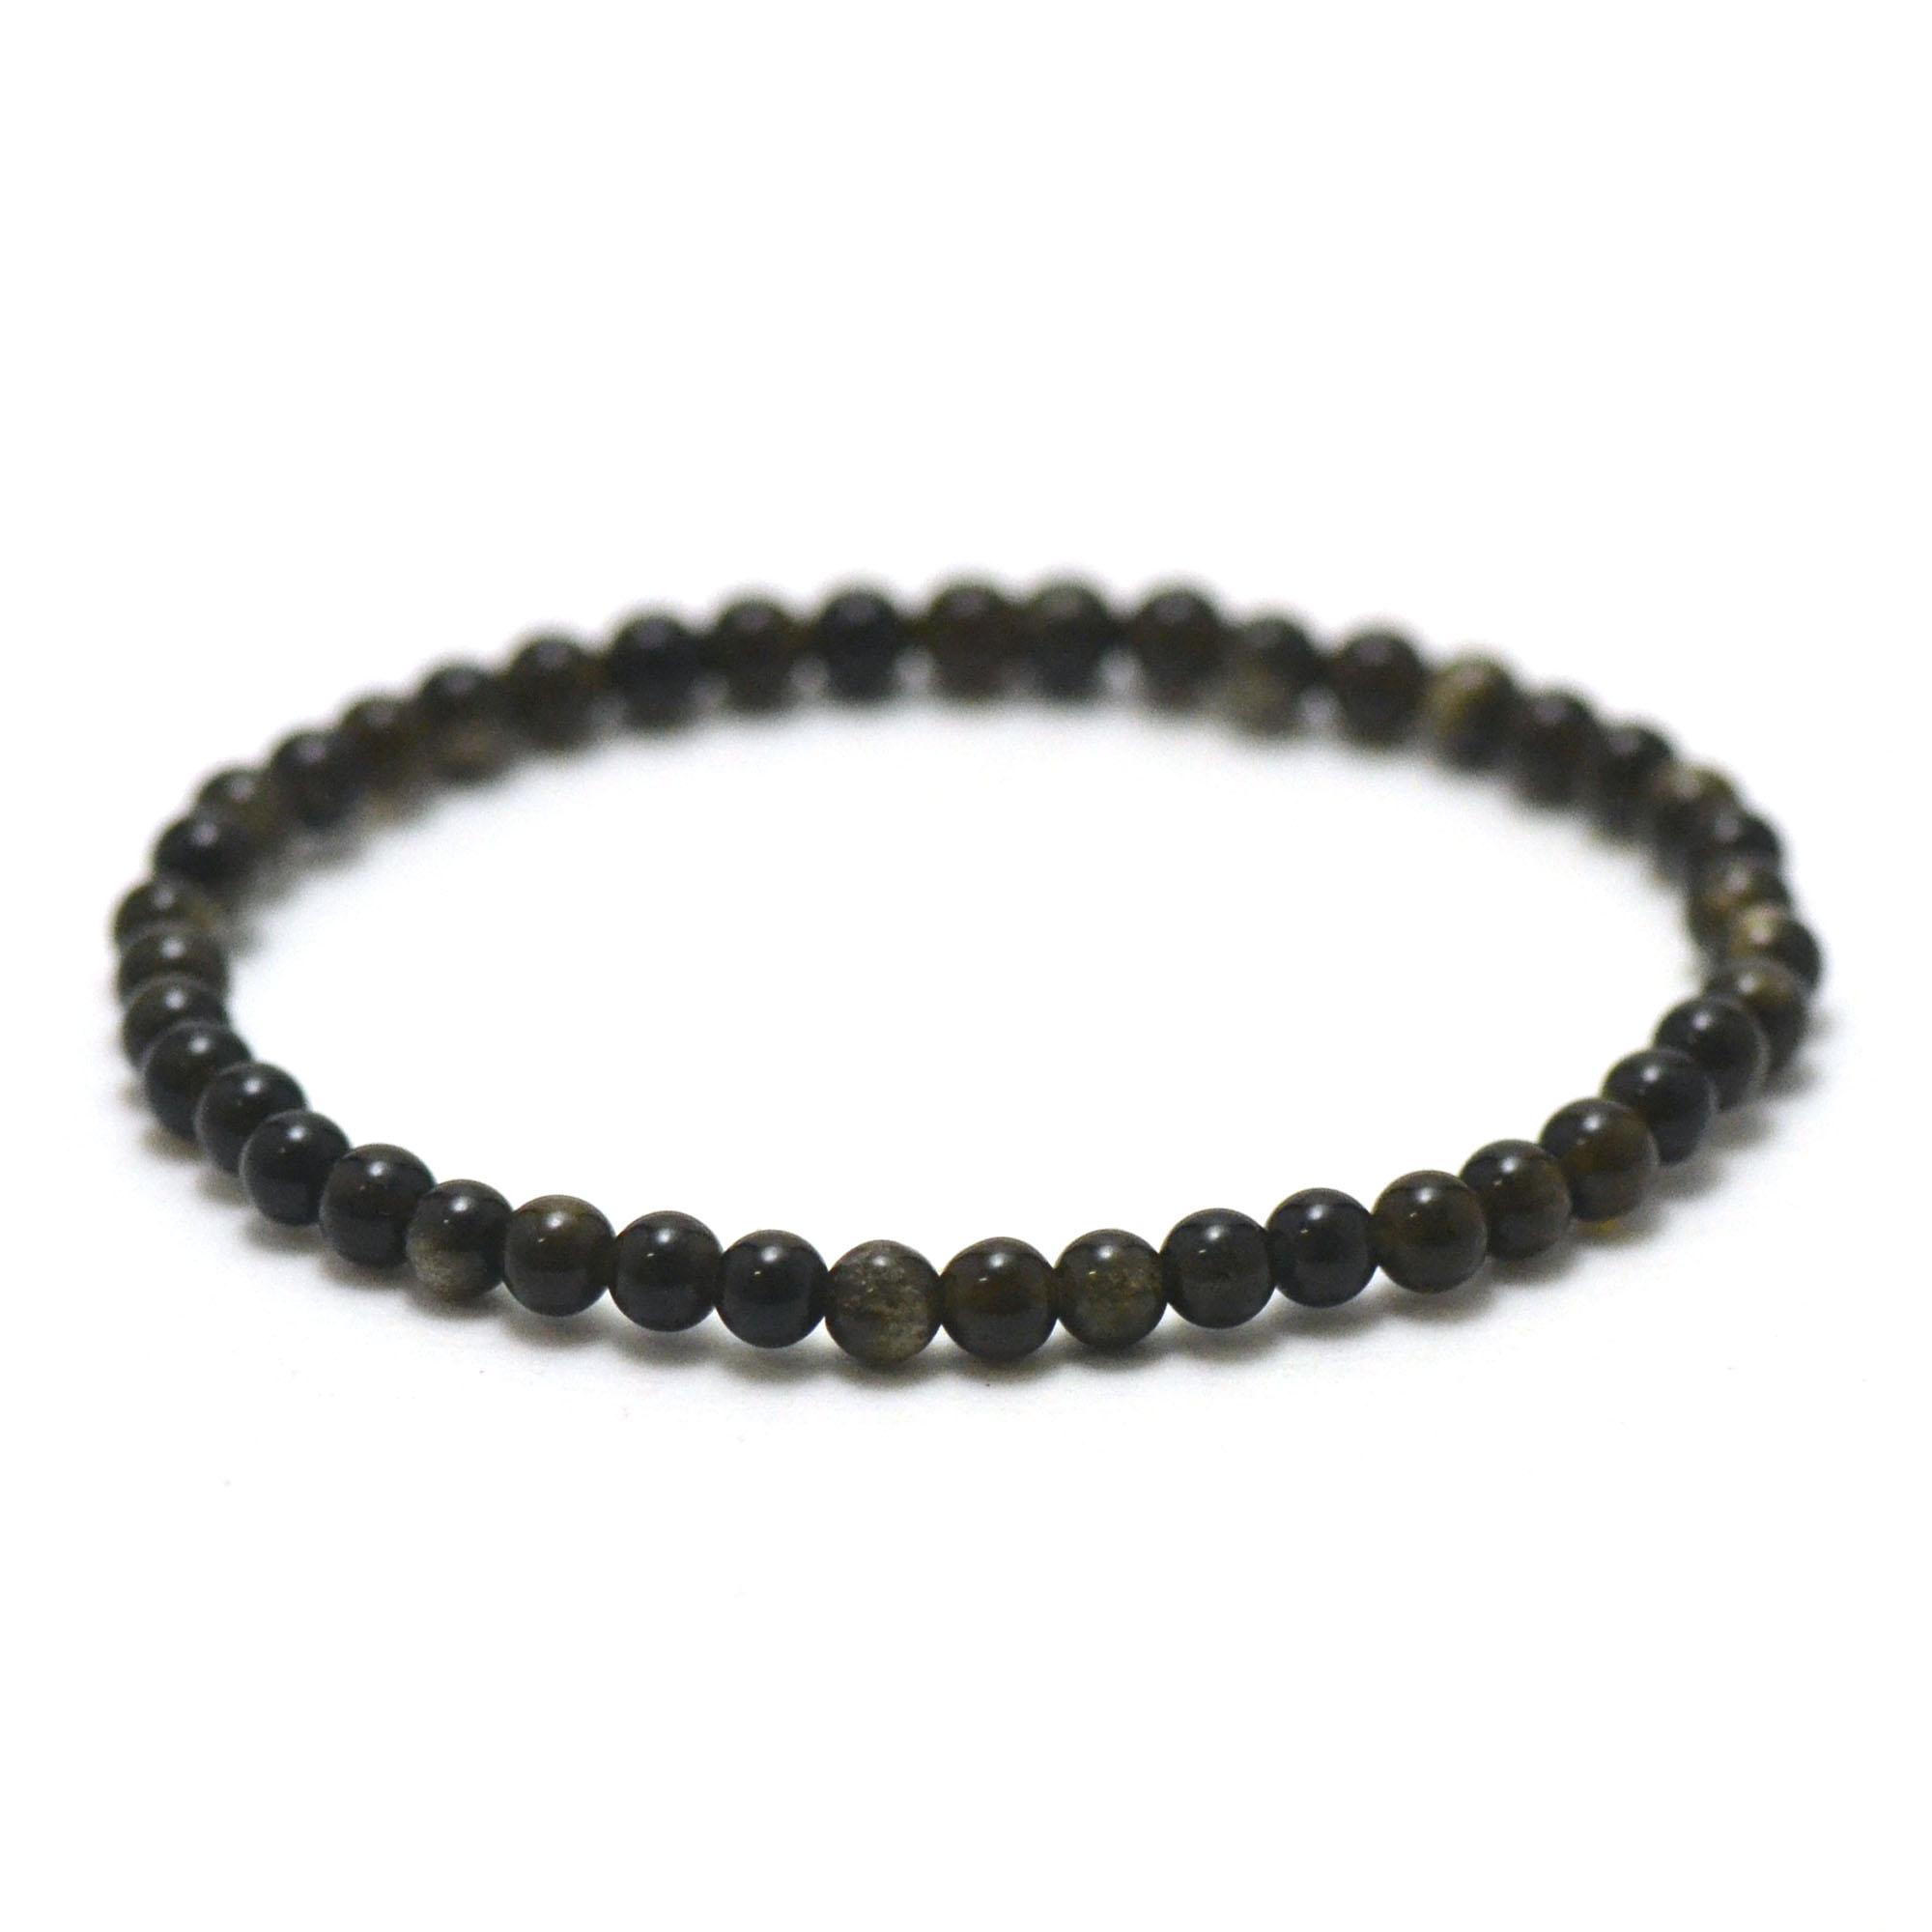 Bracelet obsidienne doré, perle ronde 4 mm